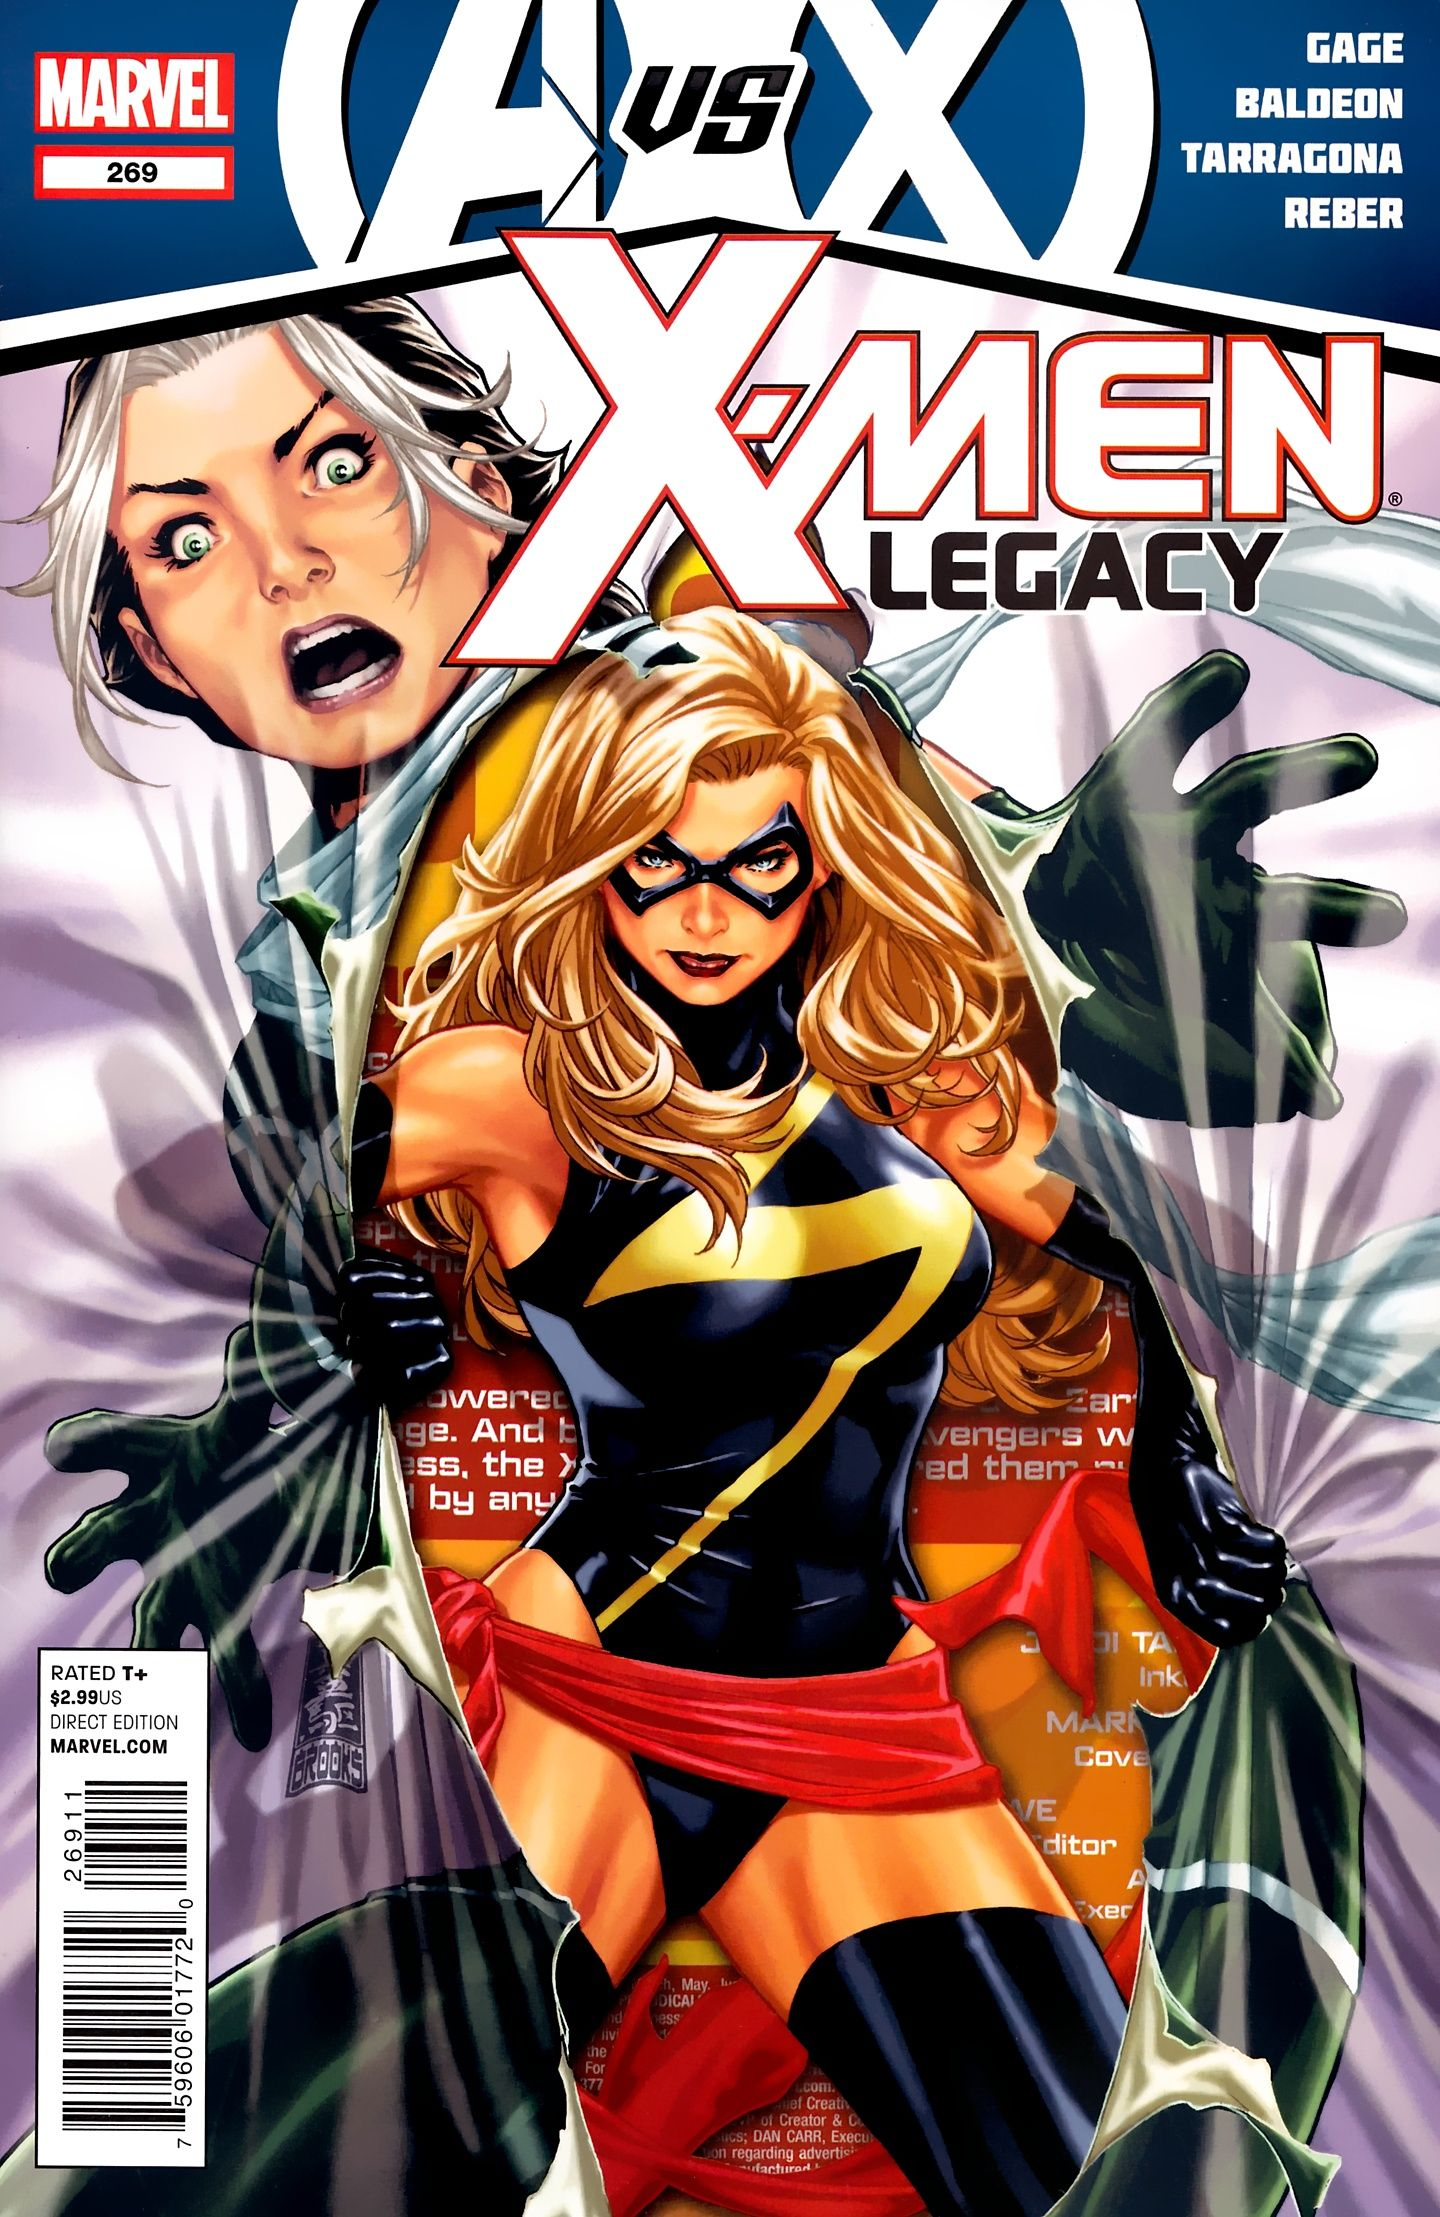 X Men Legacy Vol 1 269 Cover Art By Mark Brooks Comic Books Art Cover Art Comic Book Cover